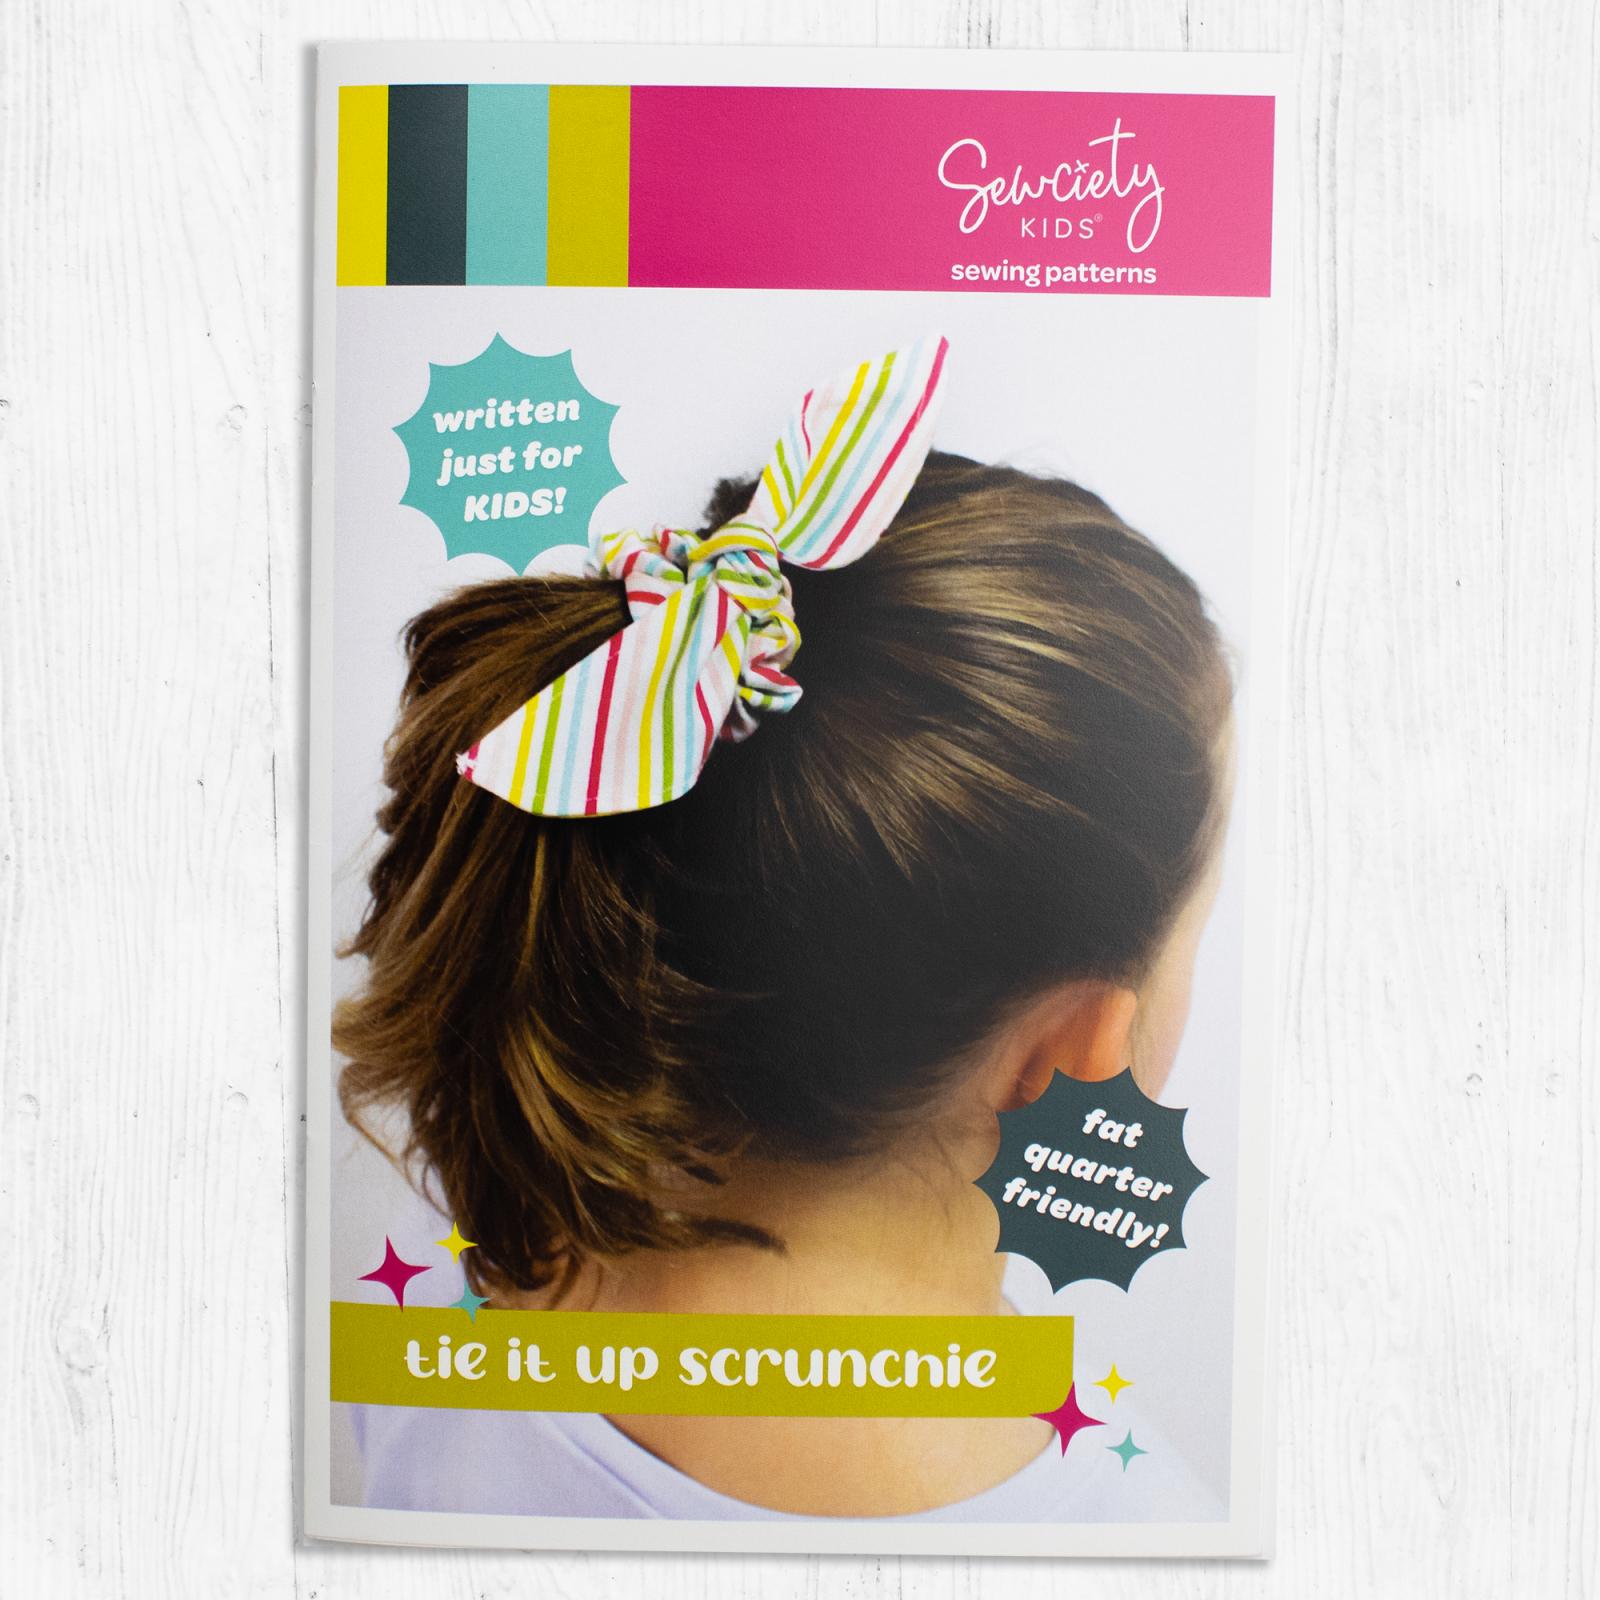 Sewciety Kids - Tie It Up Scrunchie